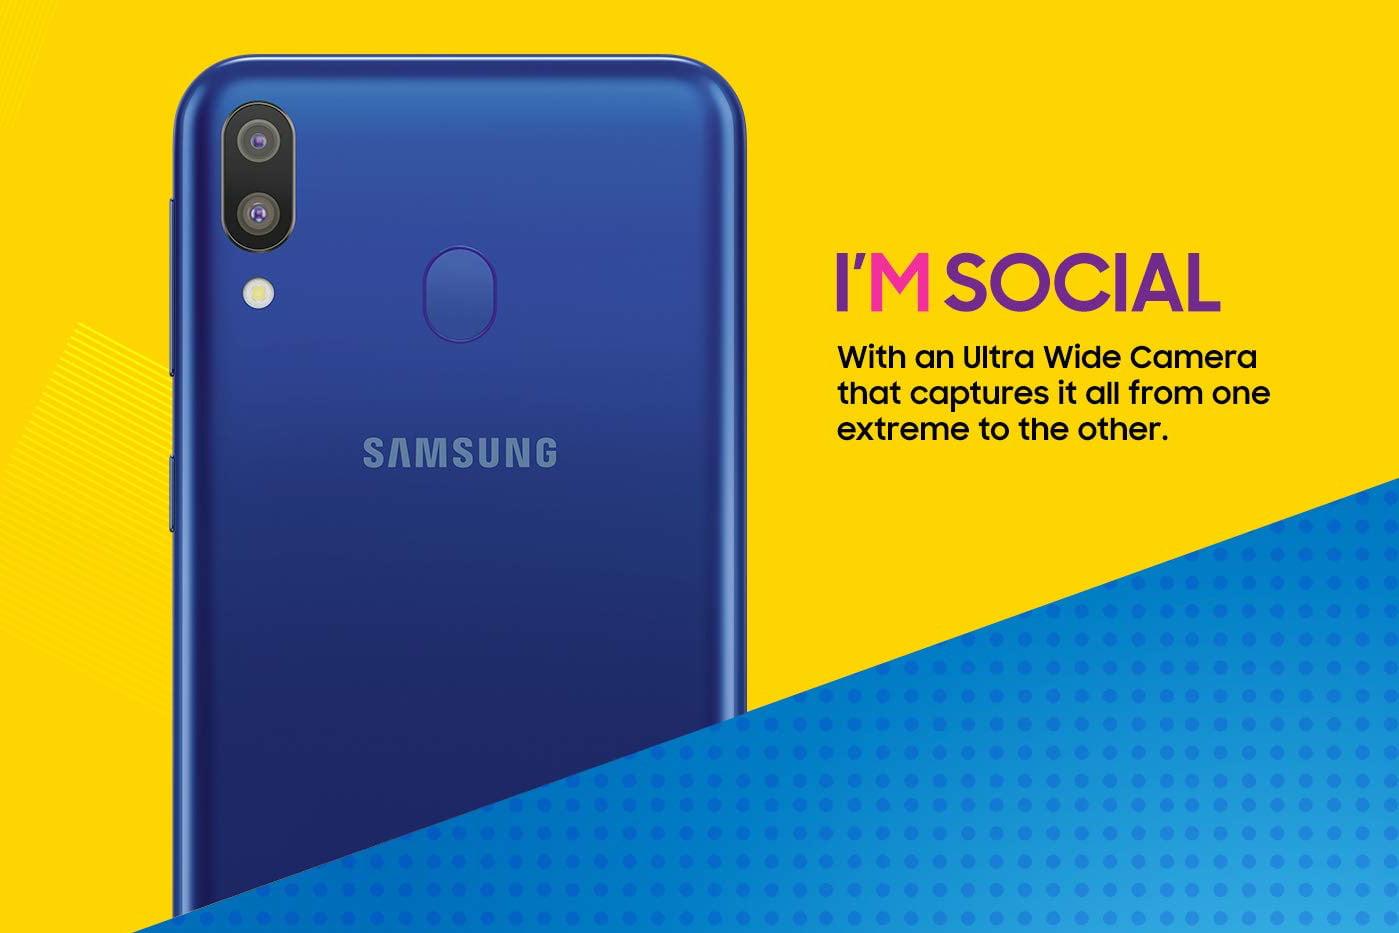 Samsung Bakal Rilis 3 Ponsel Galaxy M